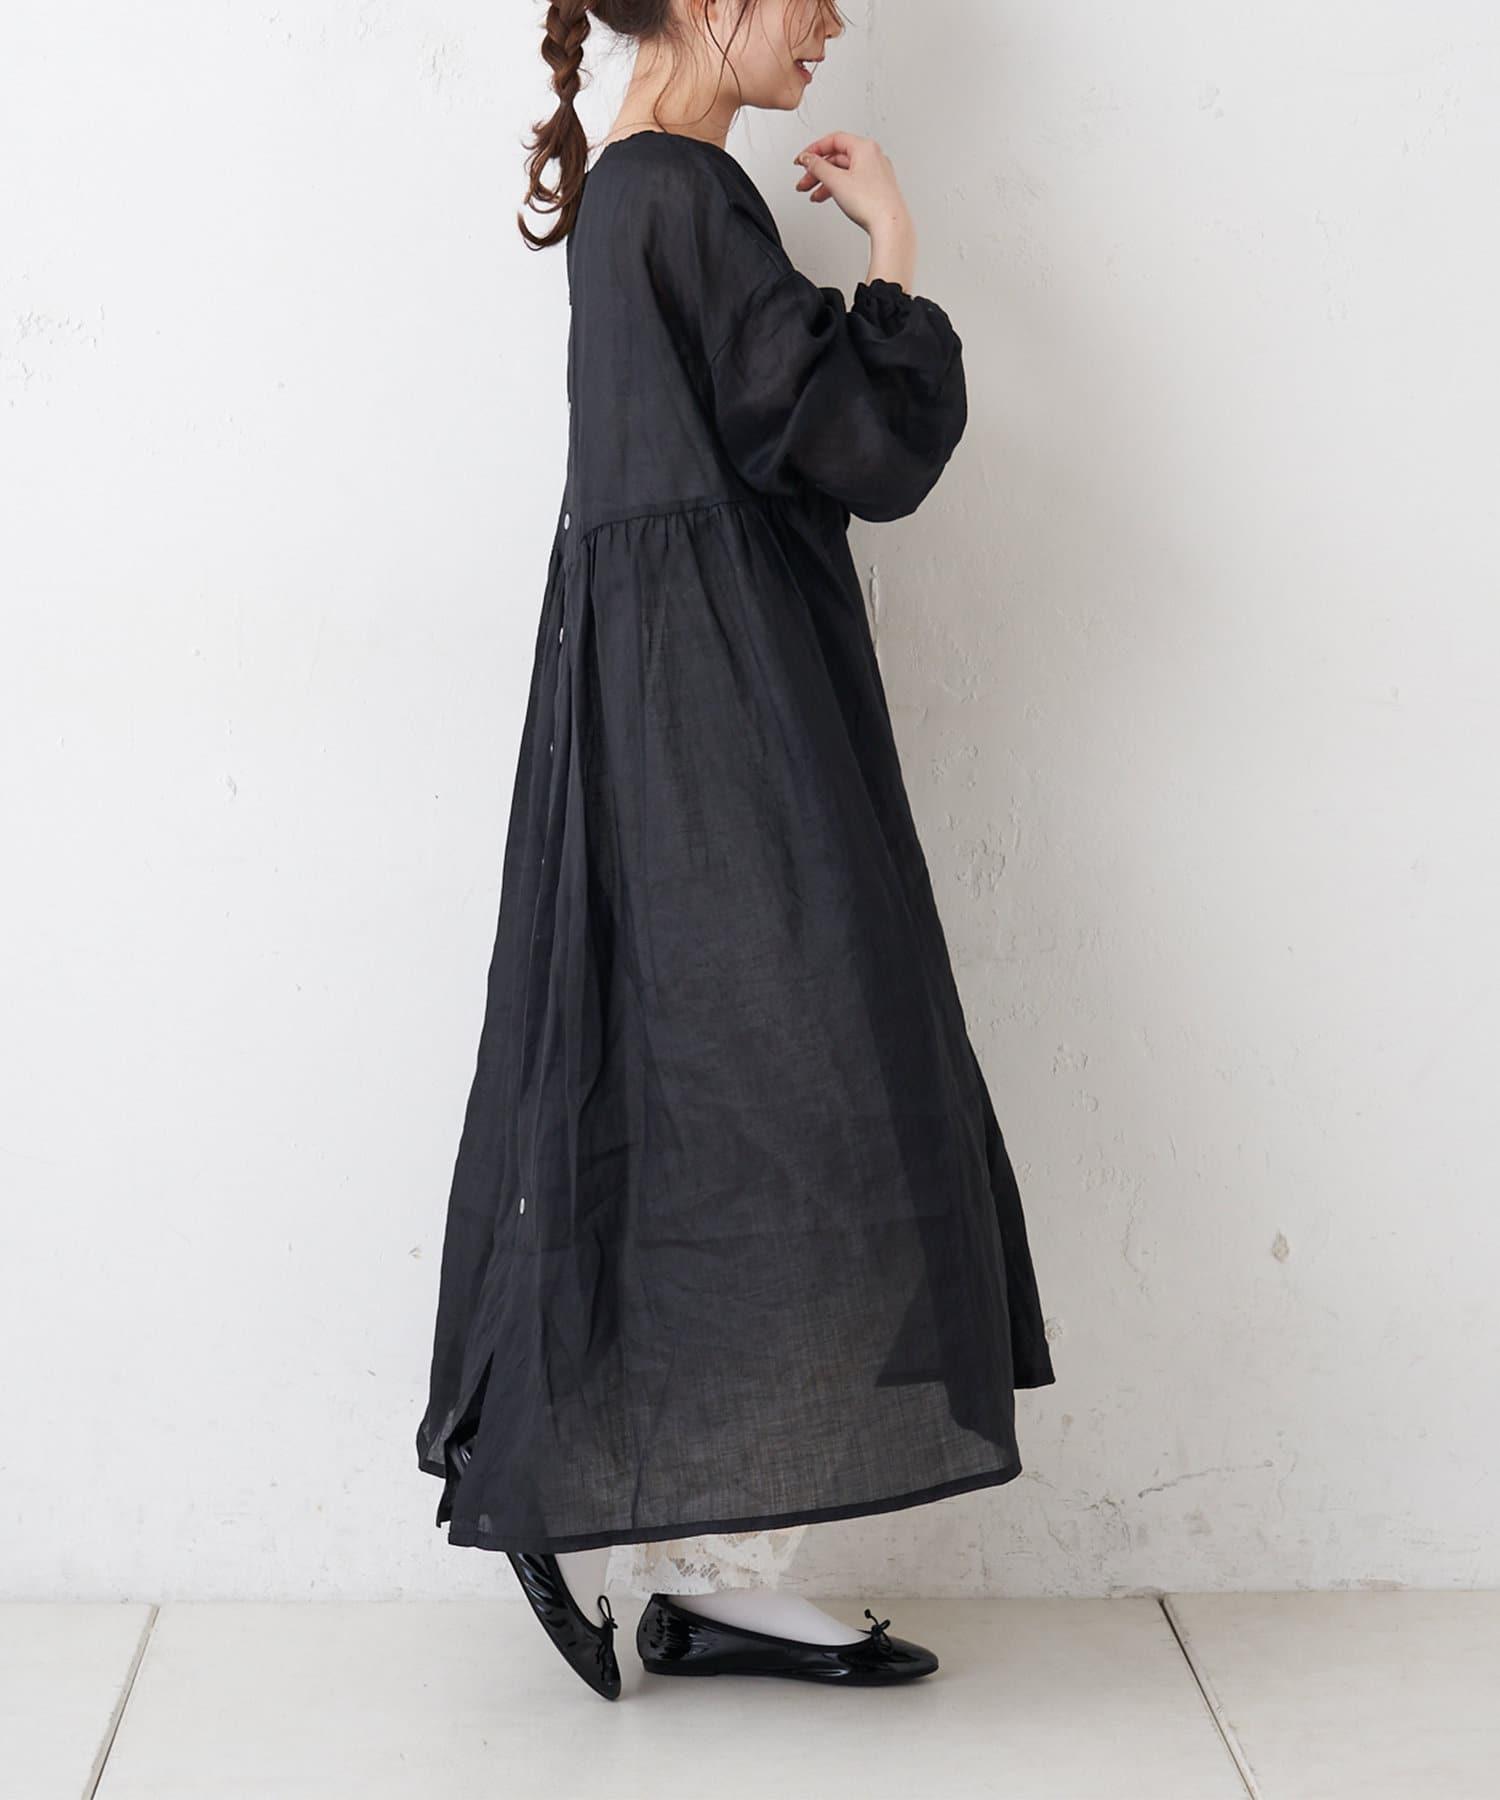 pual ce cin(ピュアルセシン) 【Du noir】ラミーワンピース